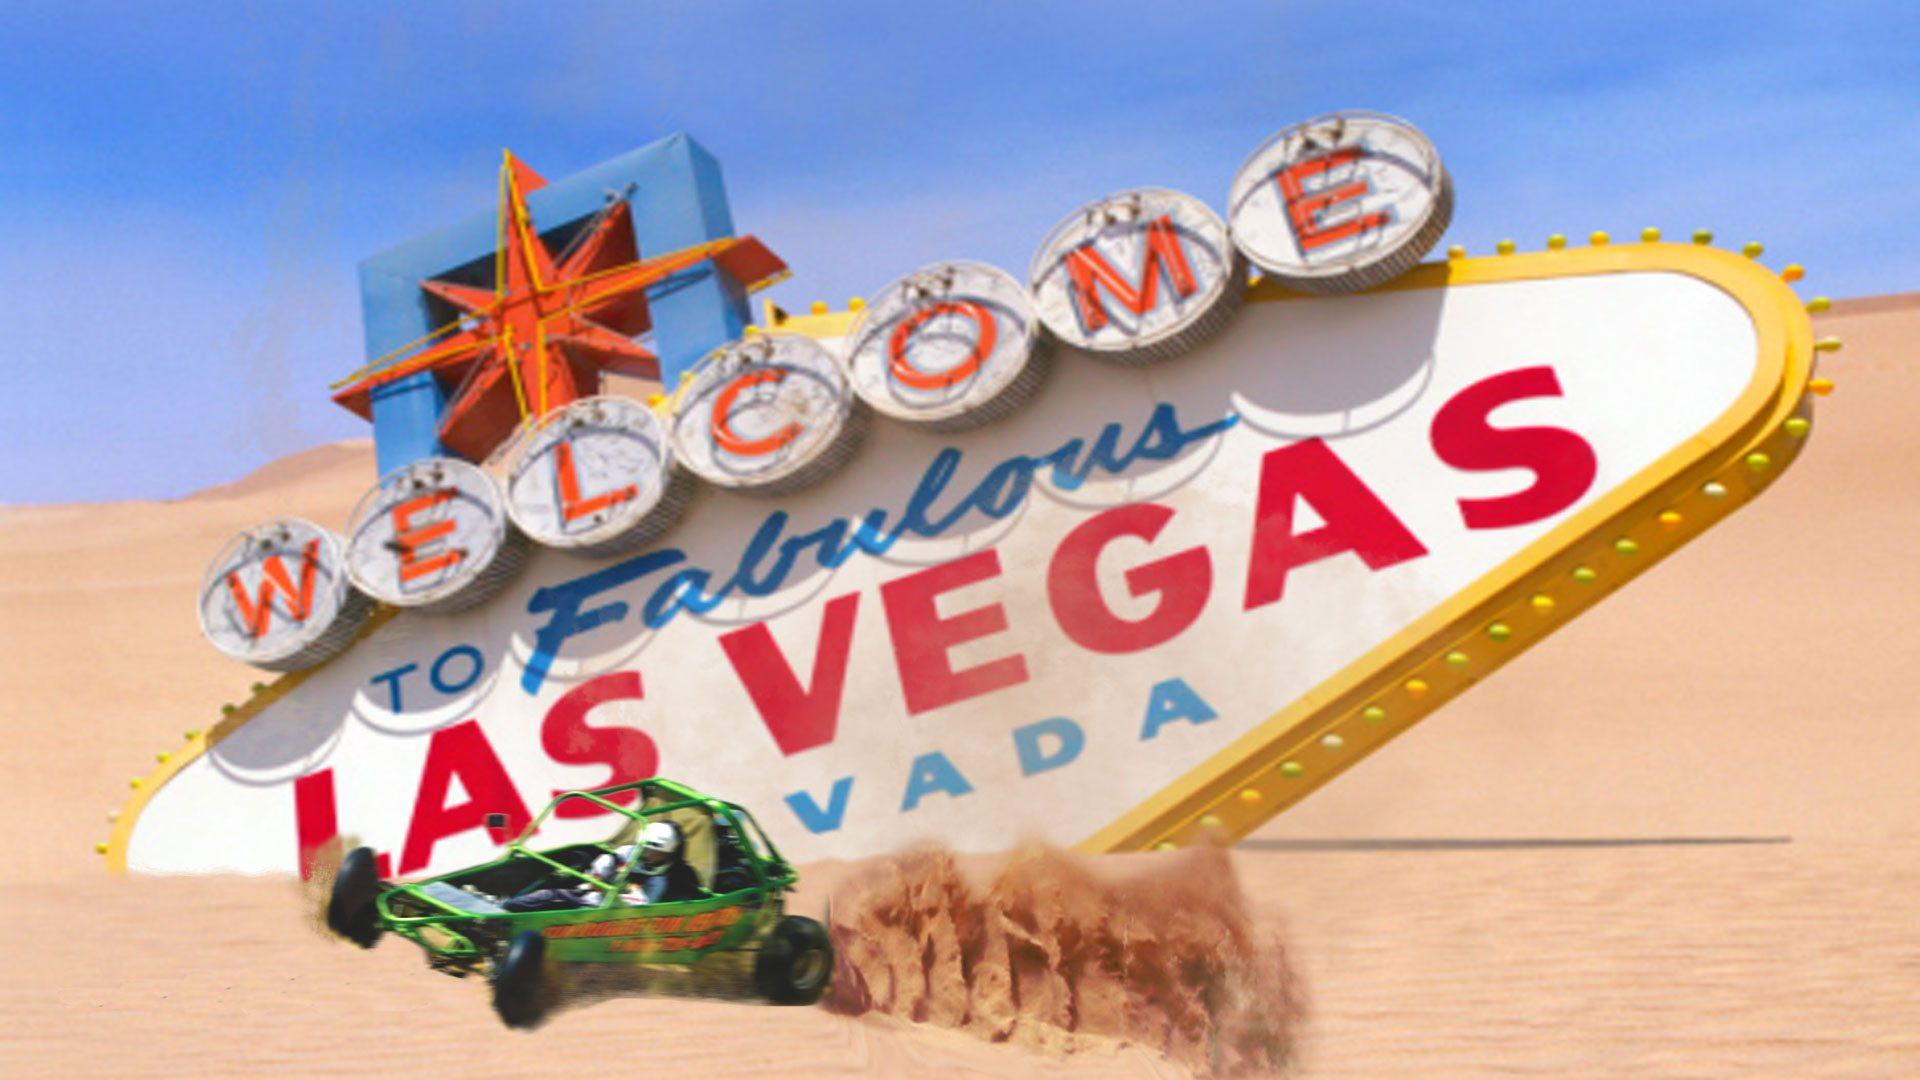 Las Vegas Adventures